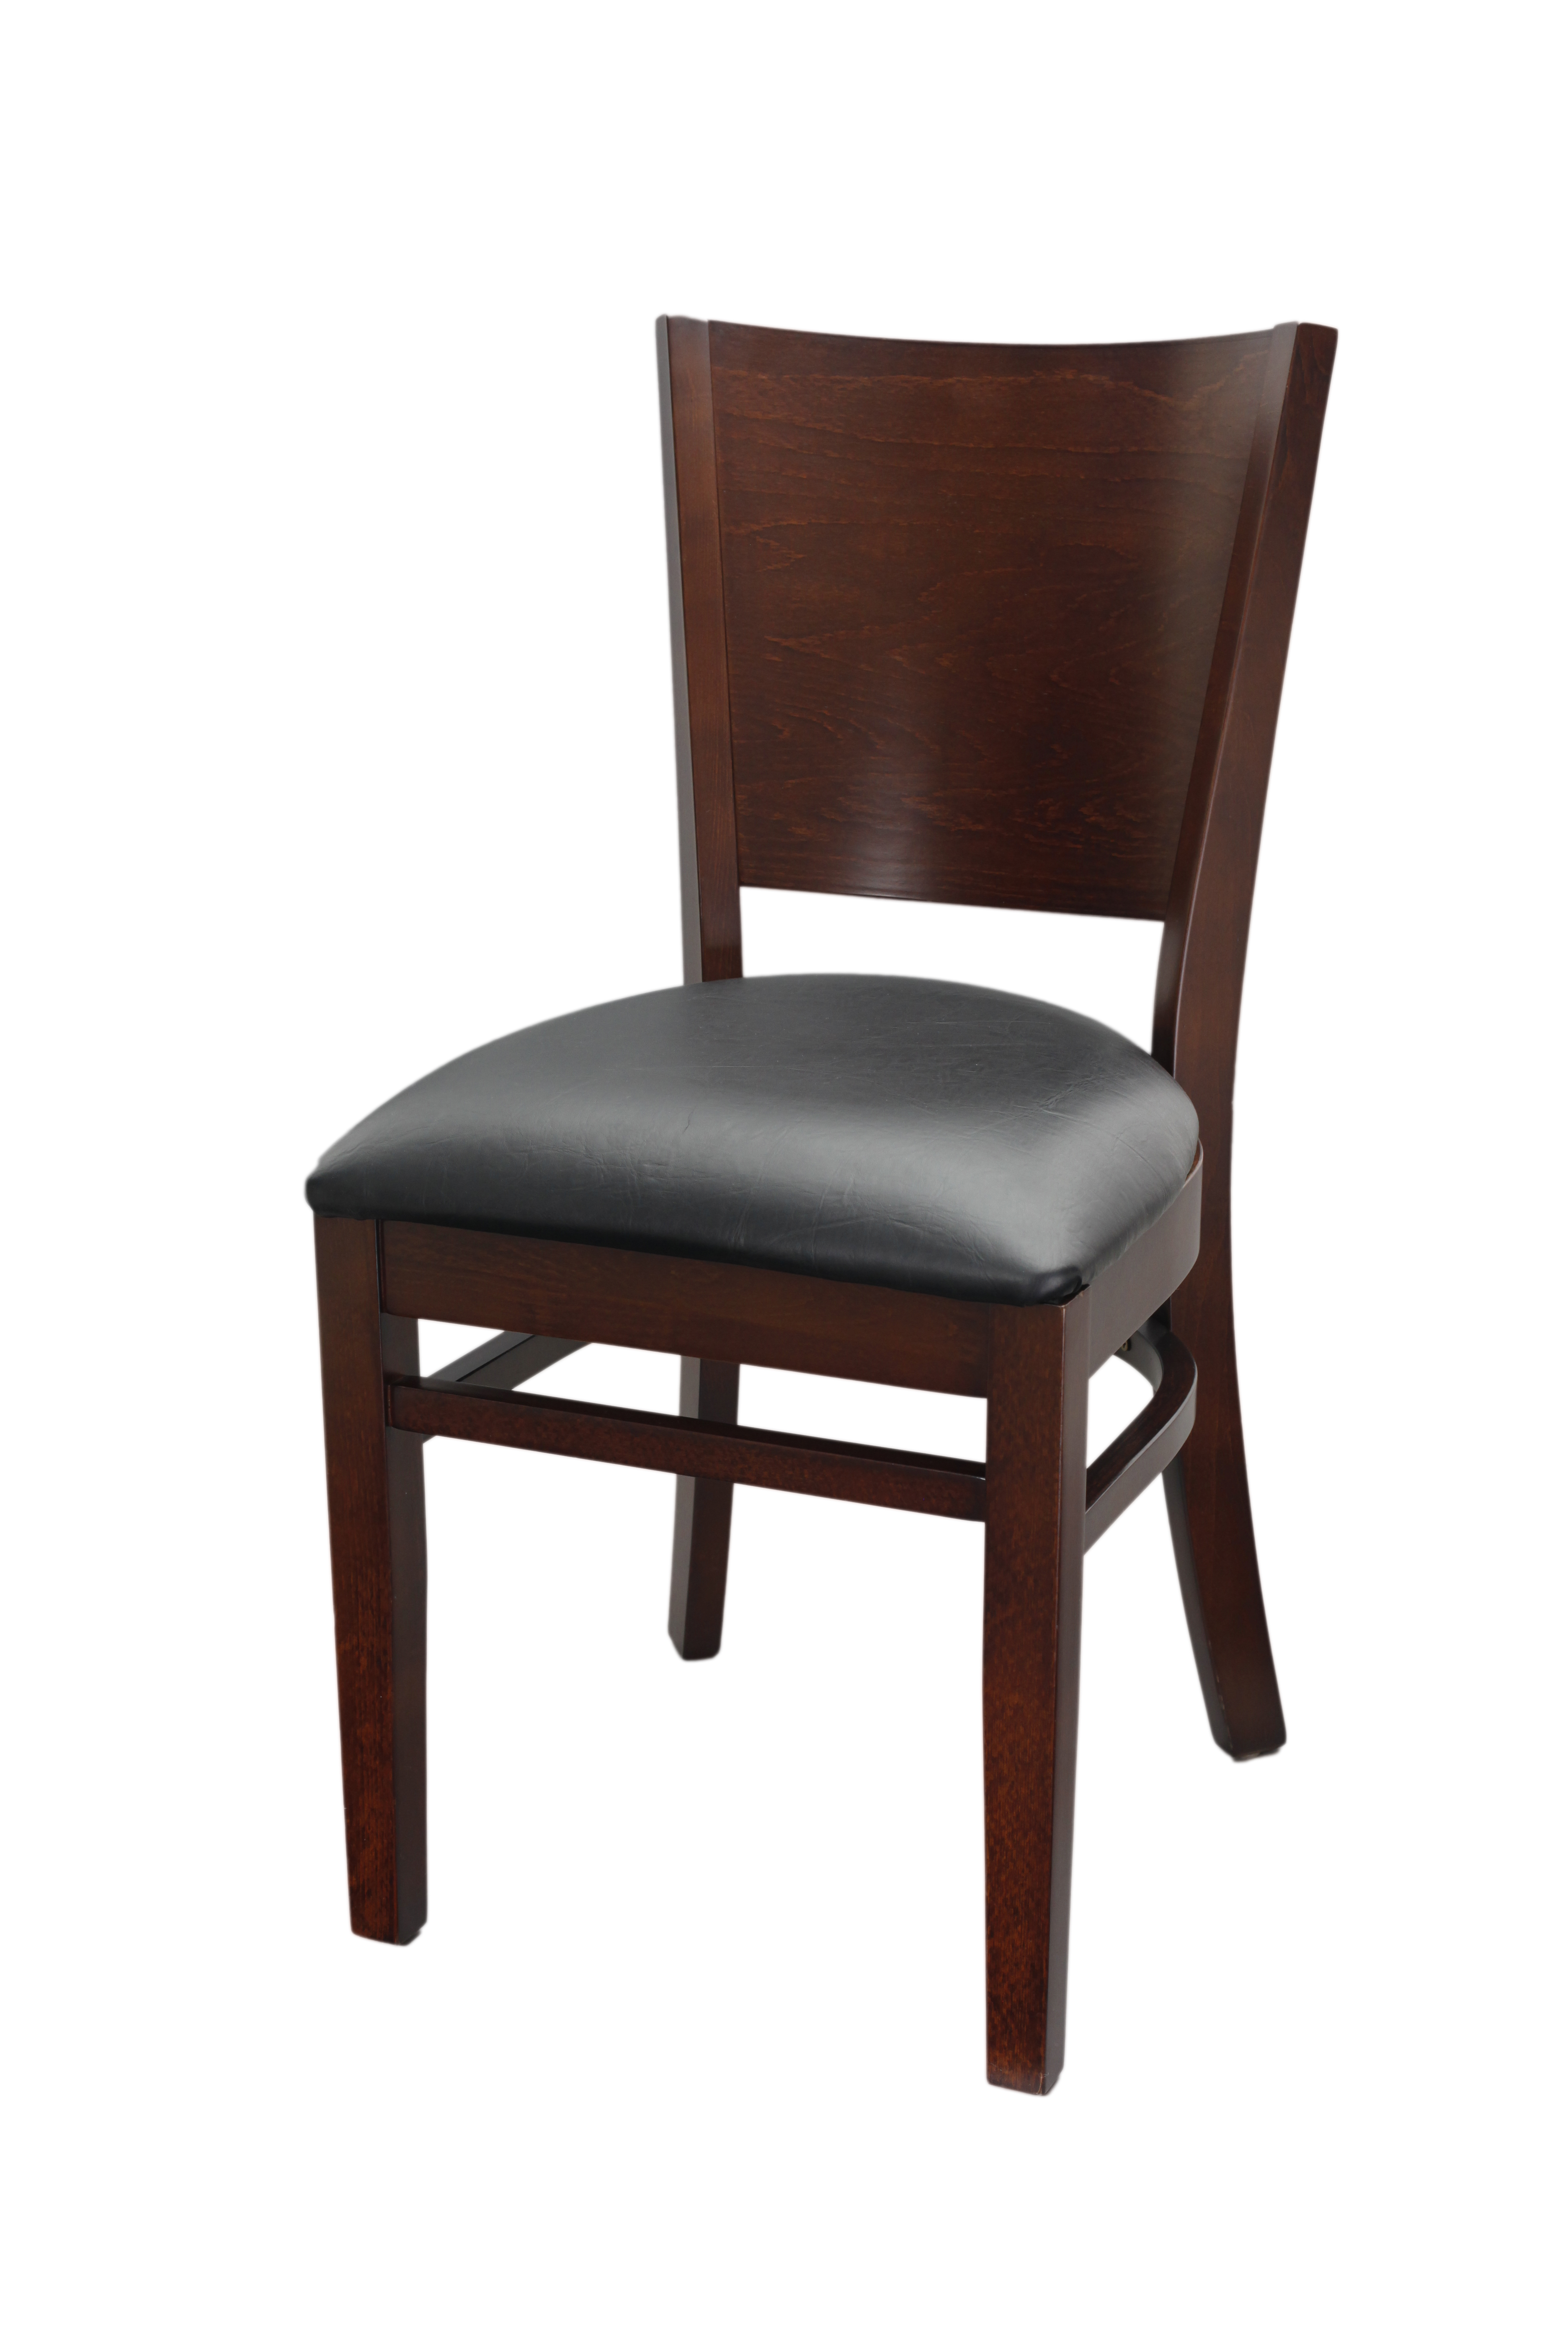 Fine dining millennium seating usa restaurant